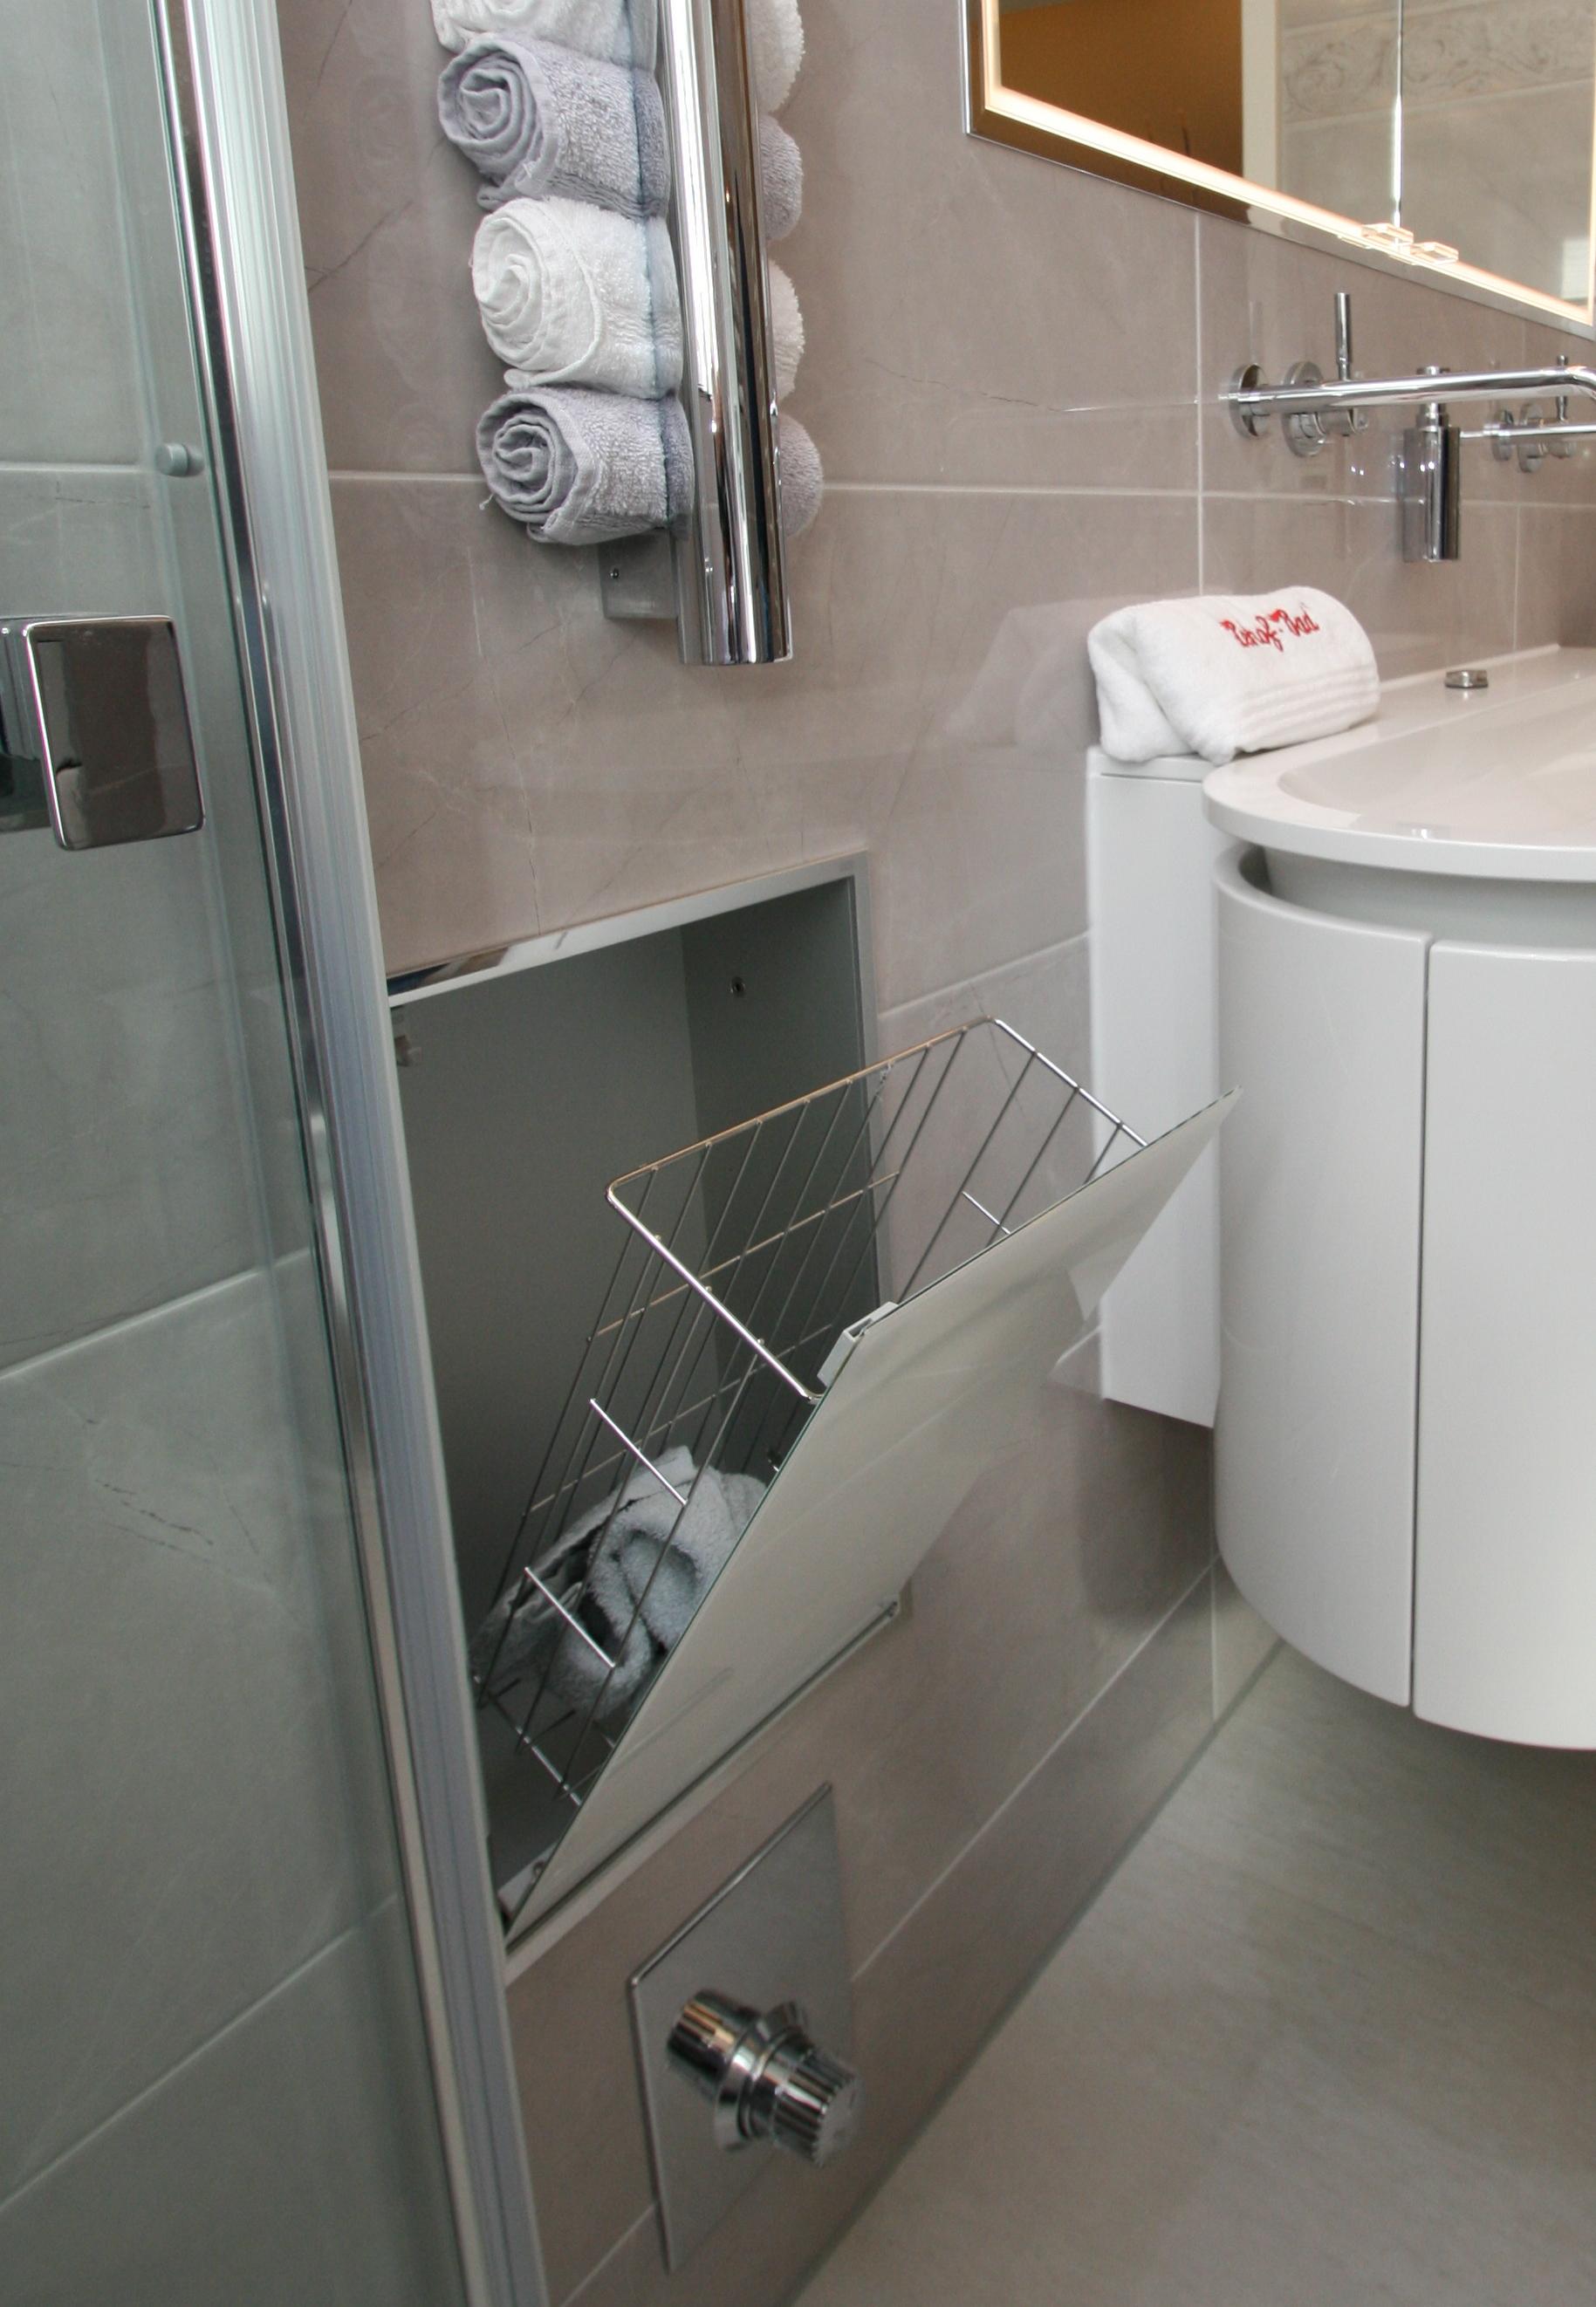 Bad Im Keller Einbauen bad im keller einbauen hausdesignhub co